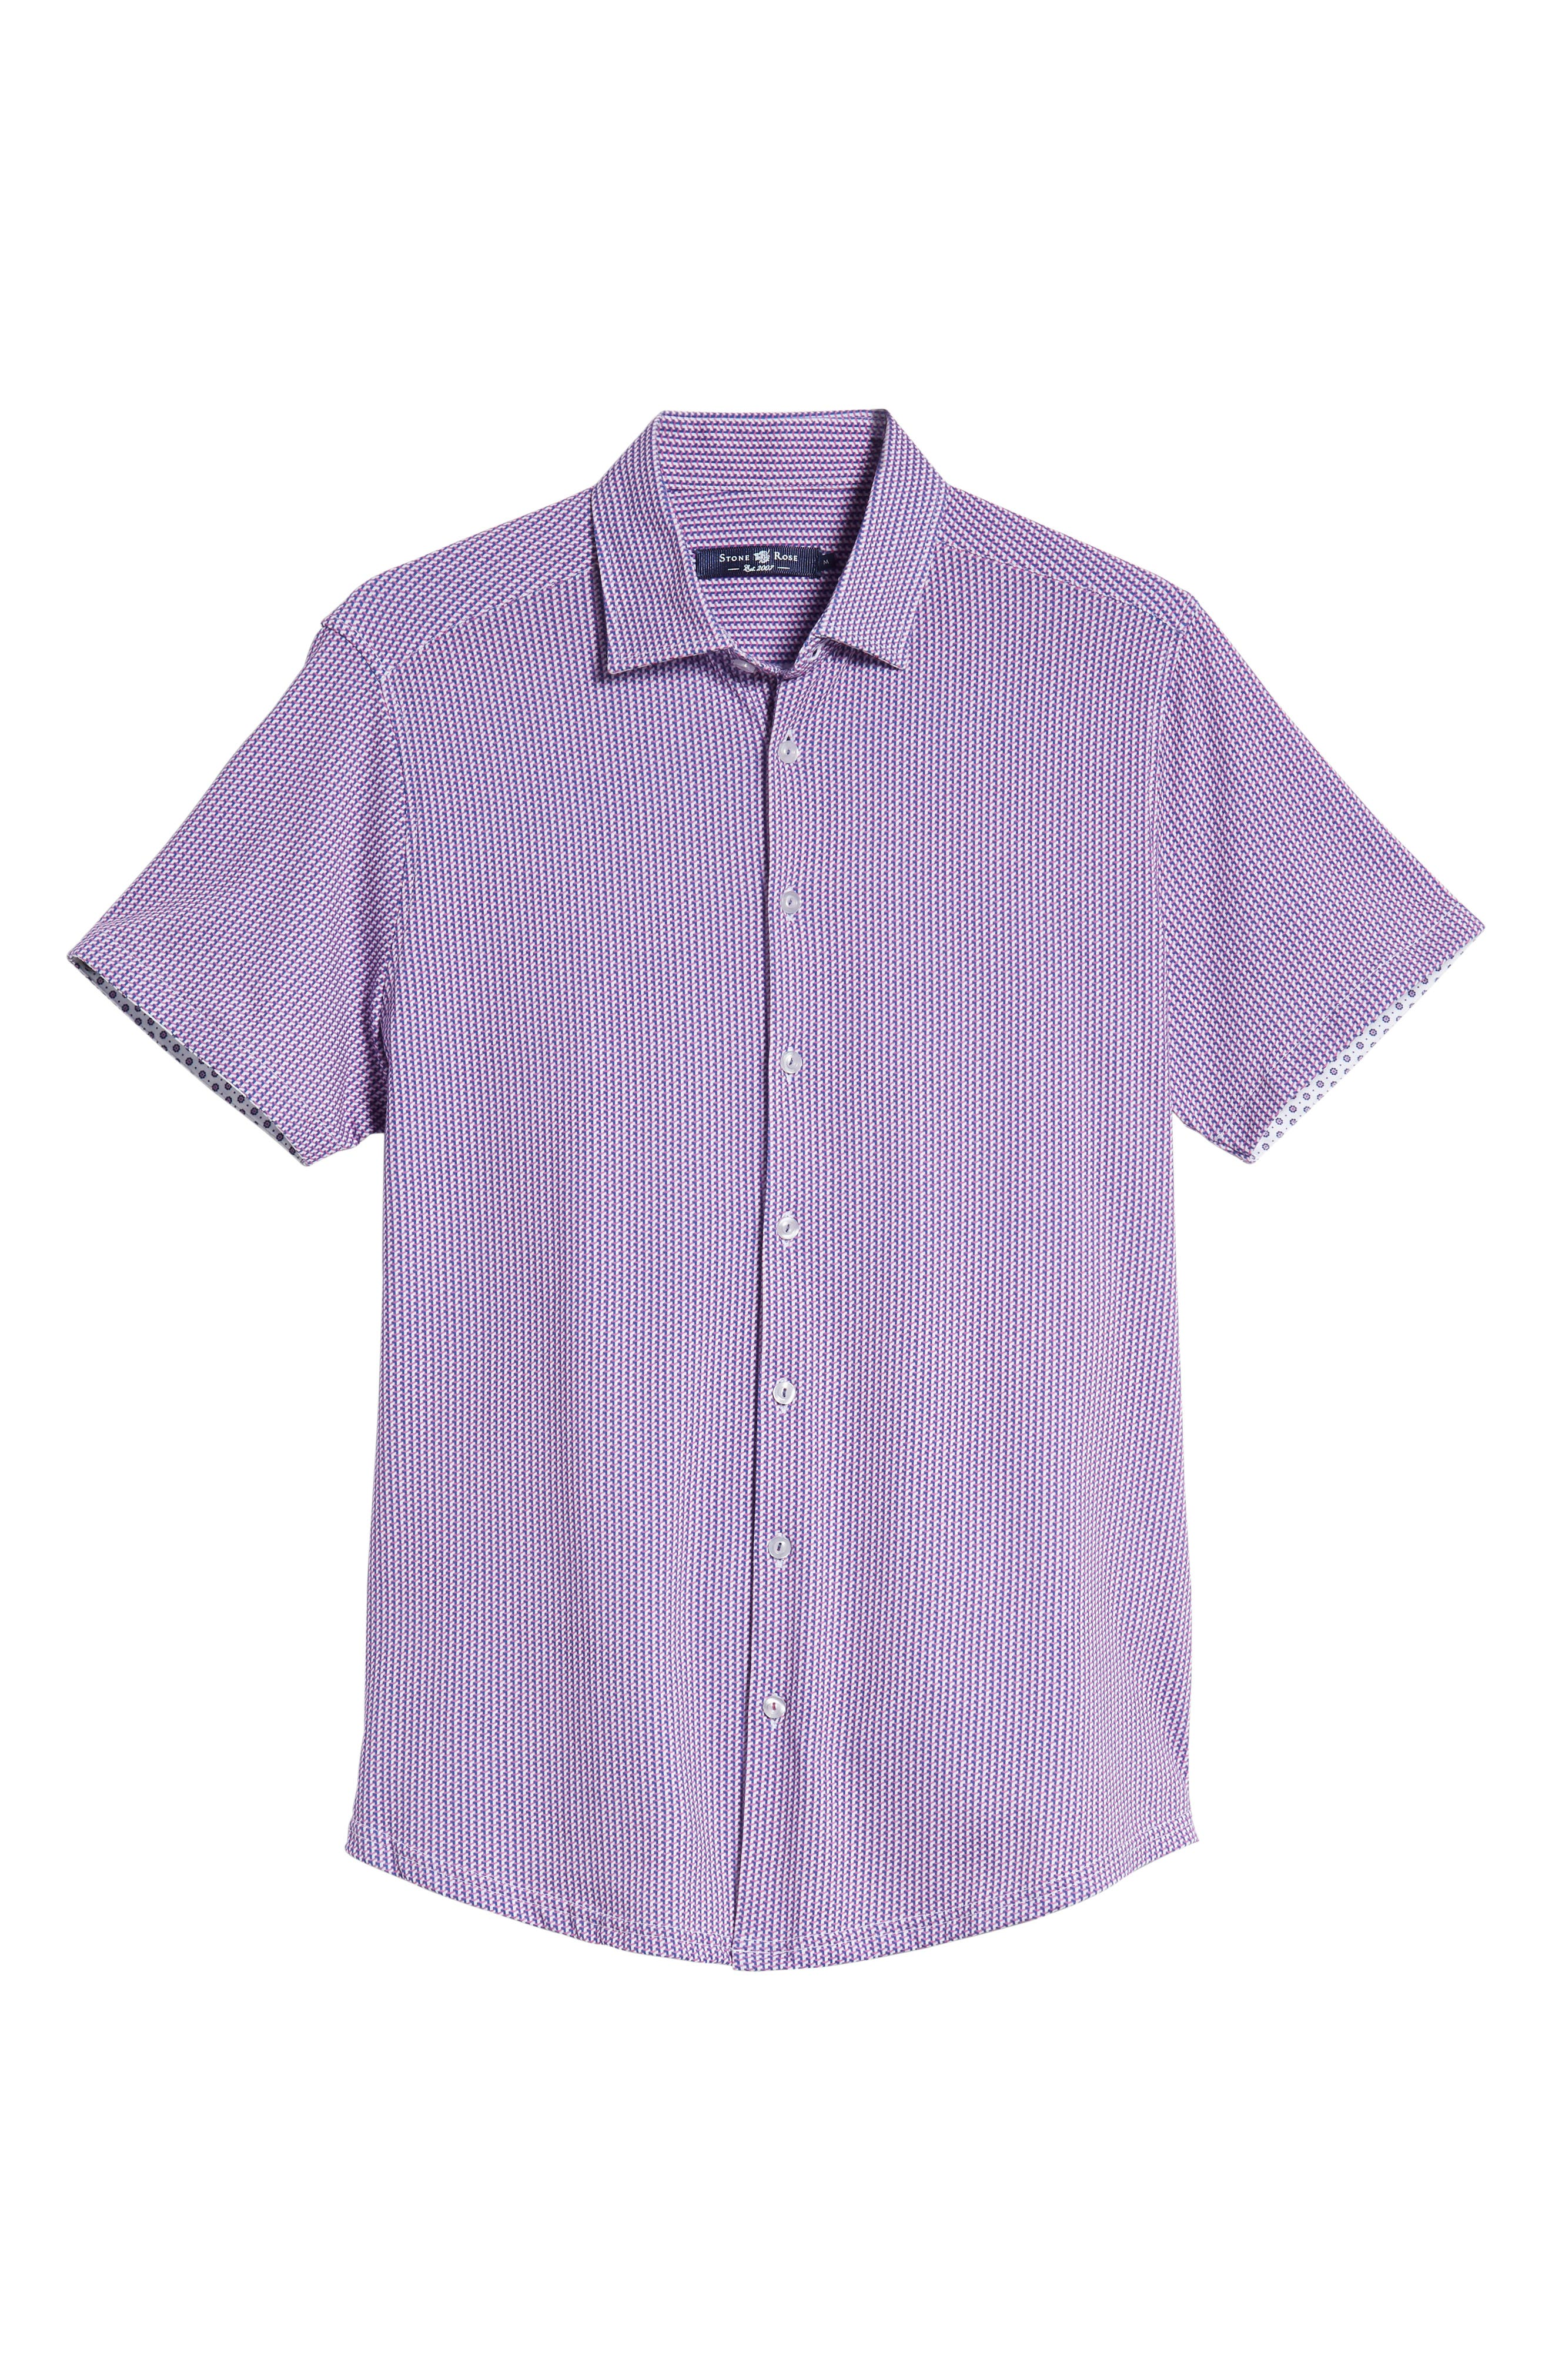 Regular Fit Geometric Print Knit Sport Shirt,                             Alternate thumbnail 5, color,                             650